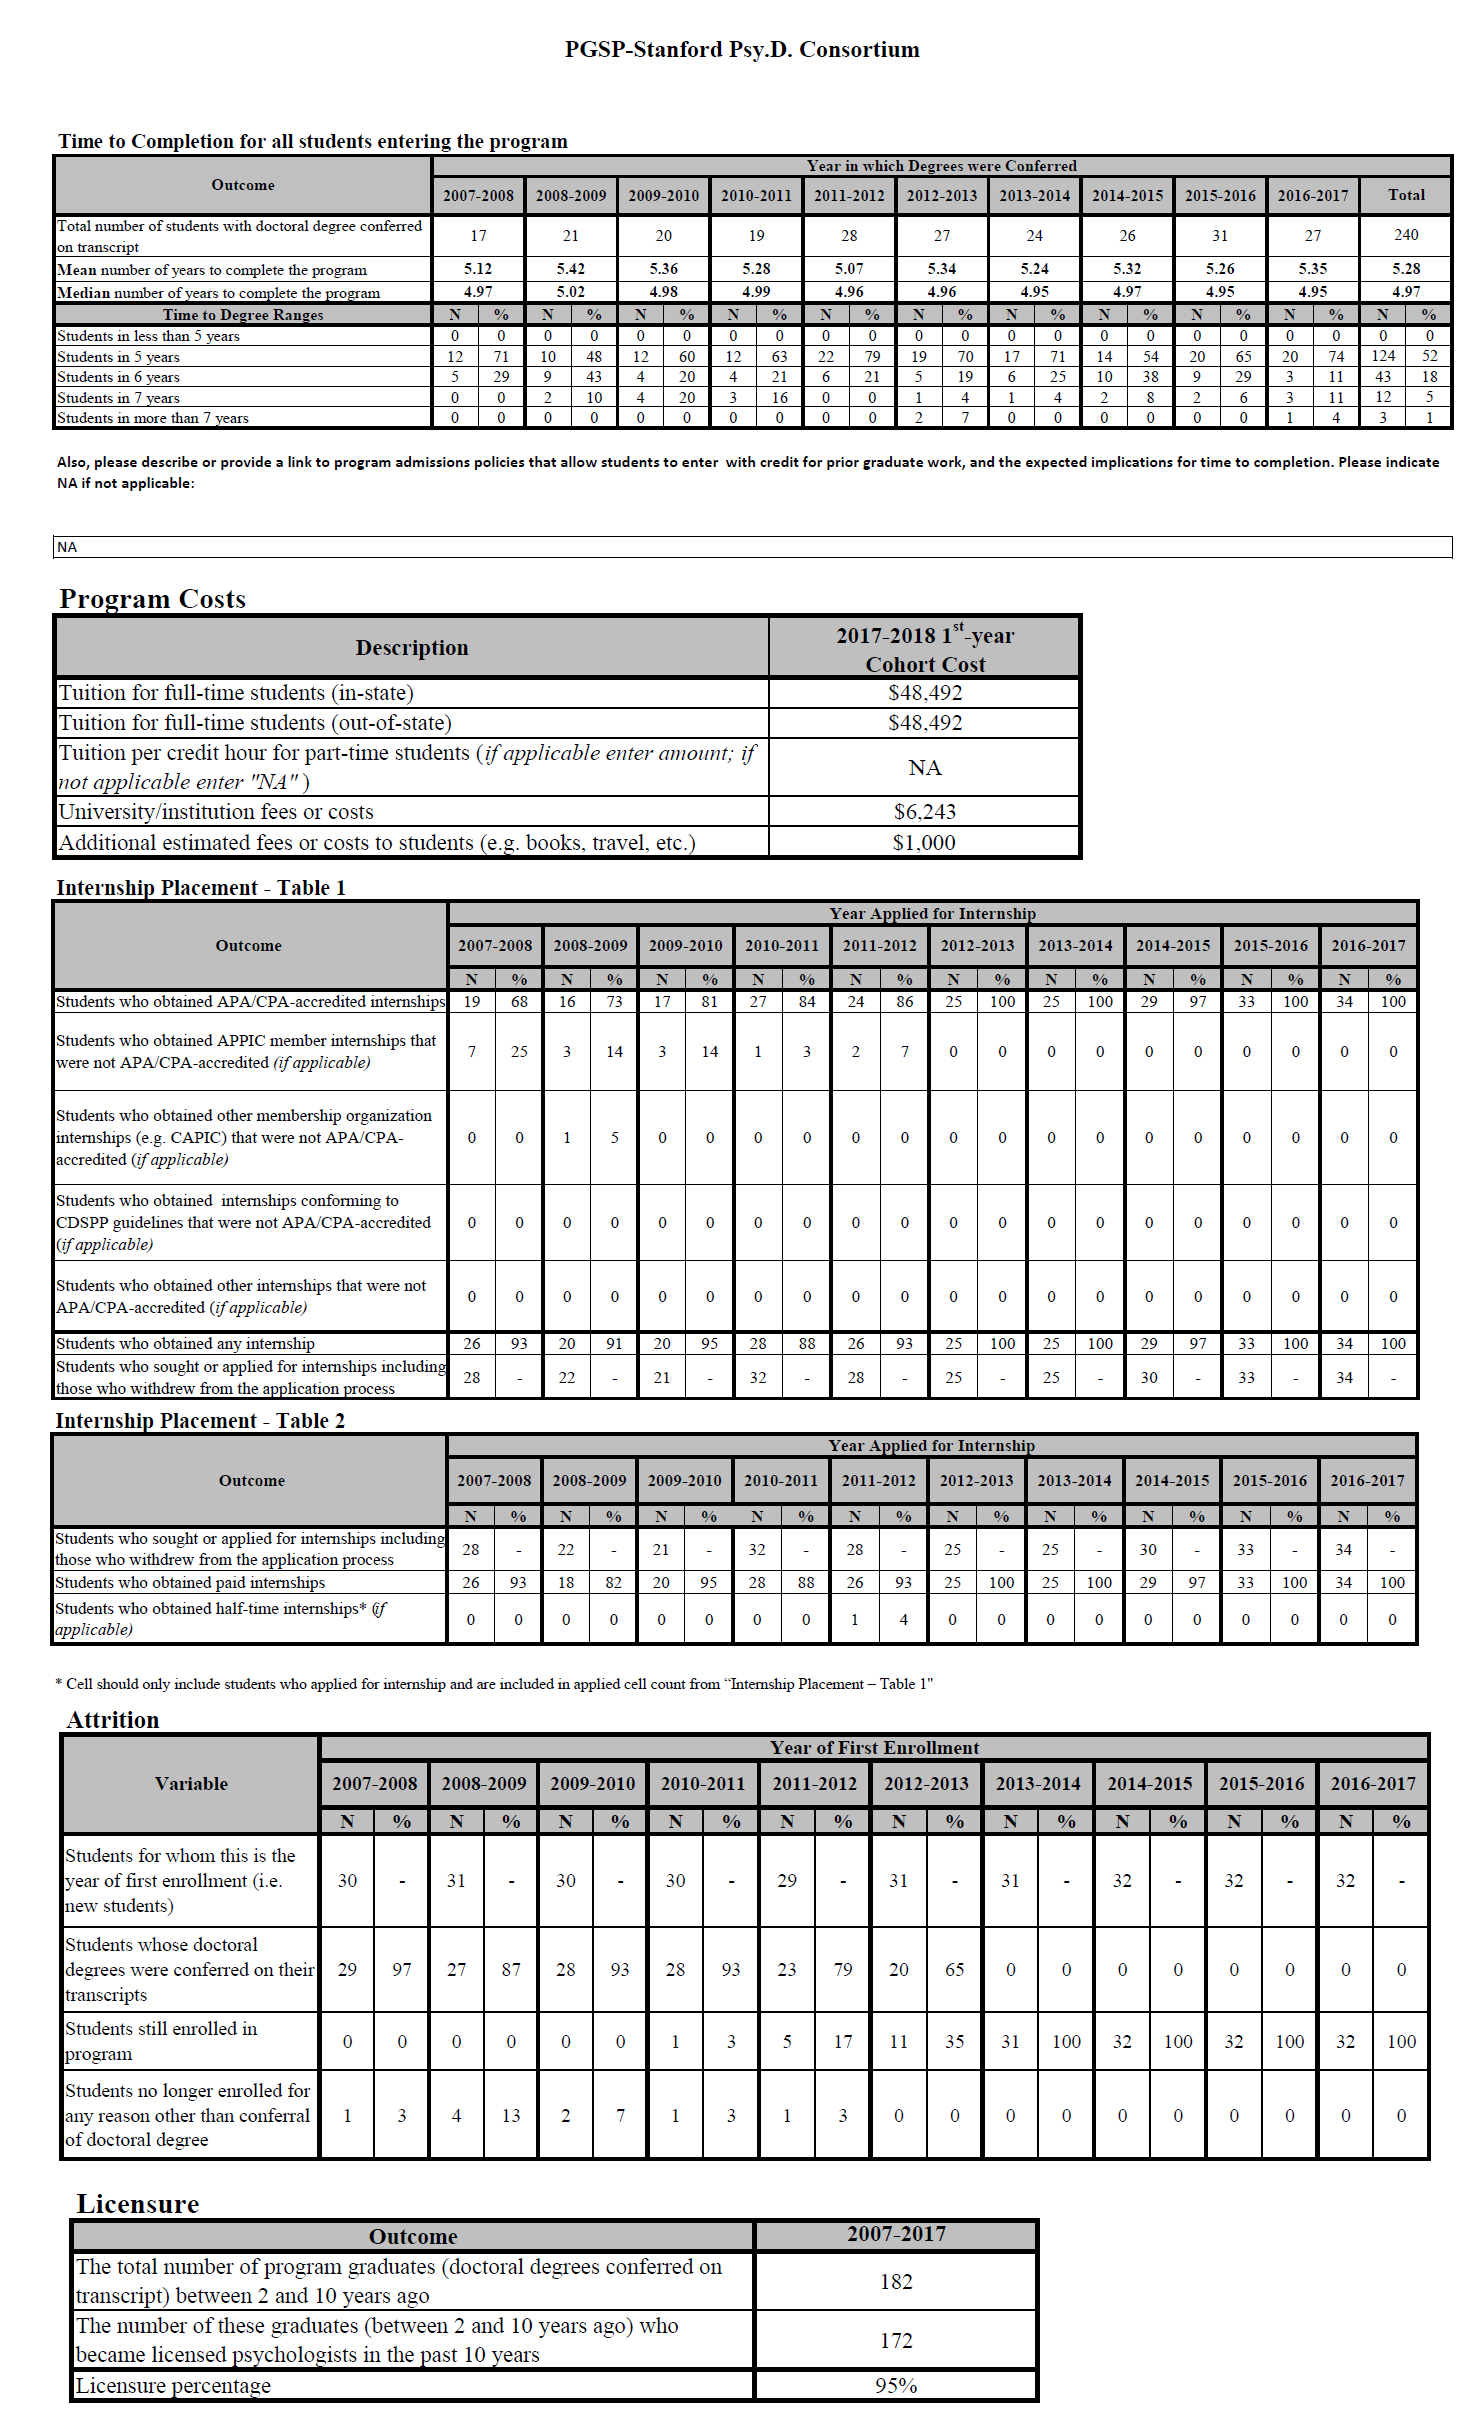 IR C-20 Data Tables